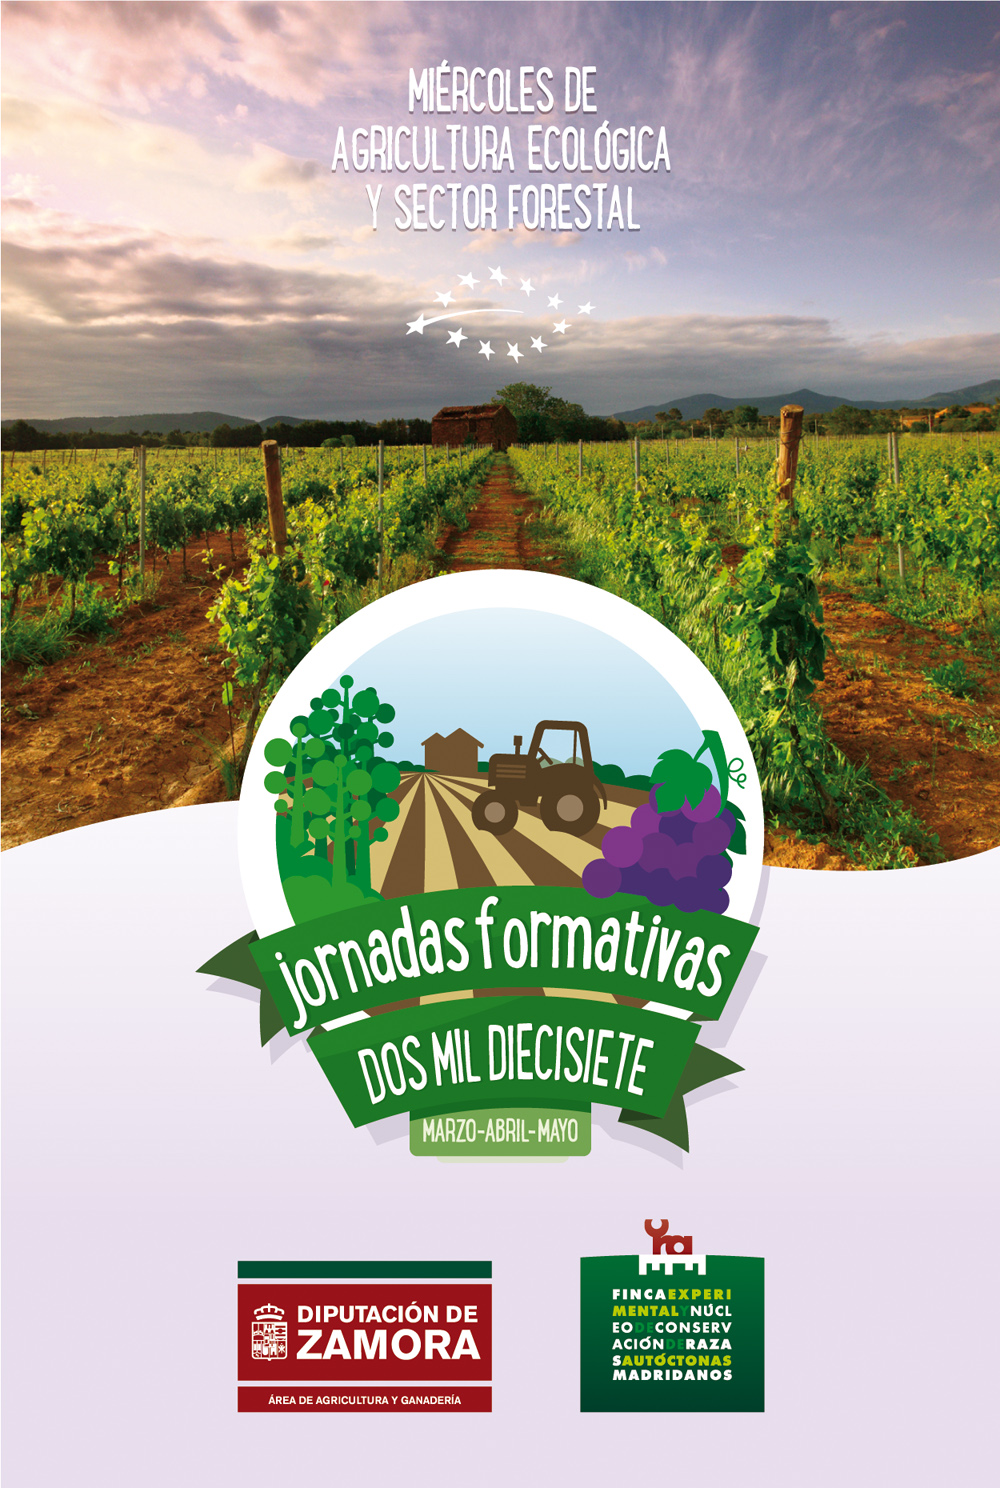 Jornadas 2017 sobre agricultura ecológica y sector forestal